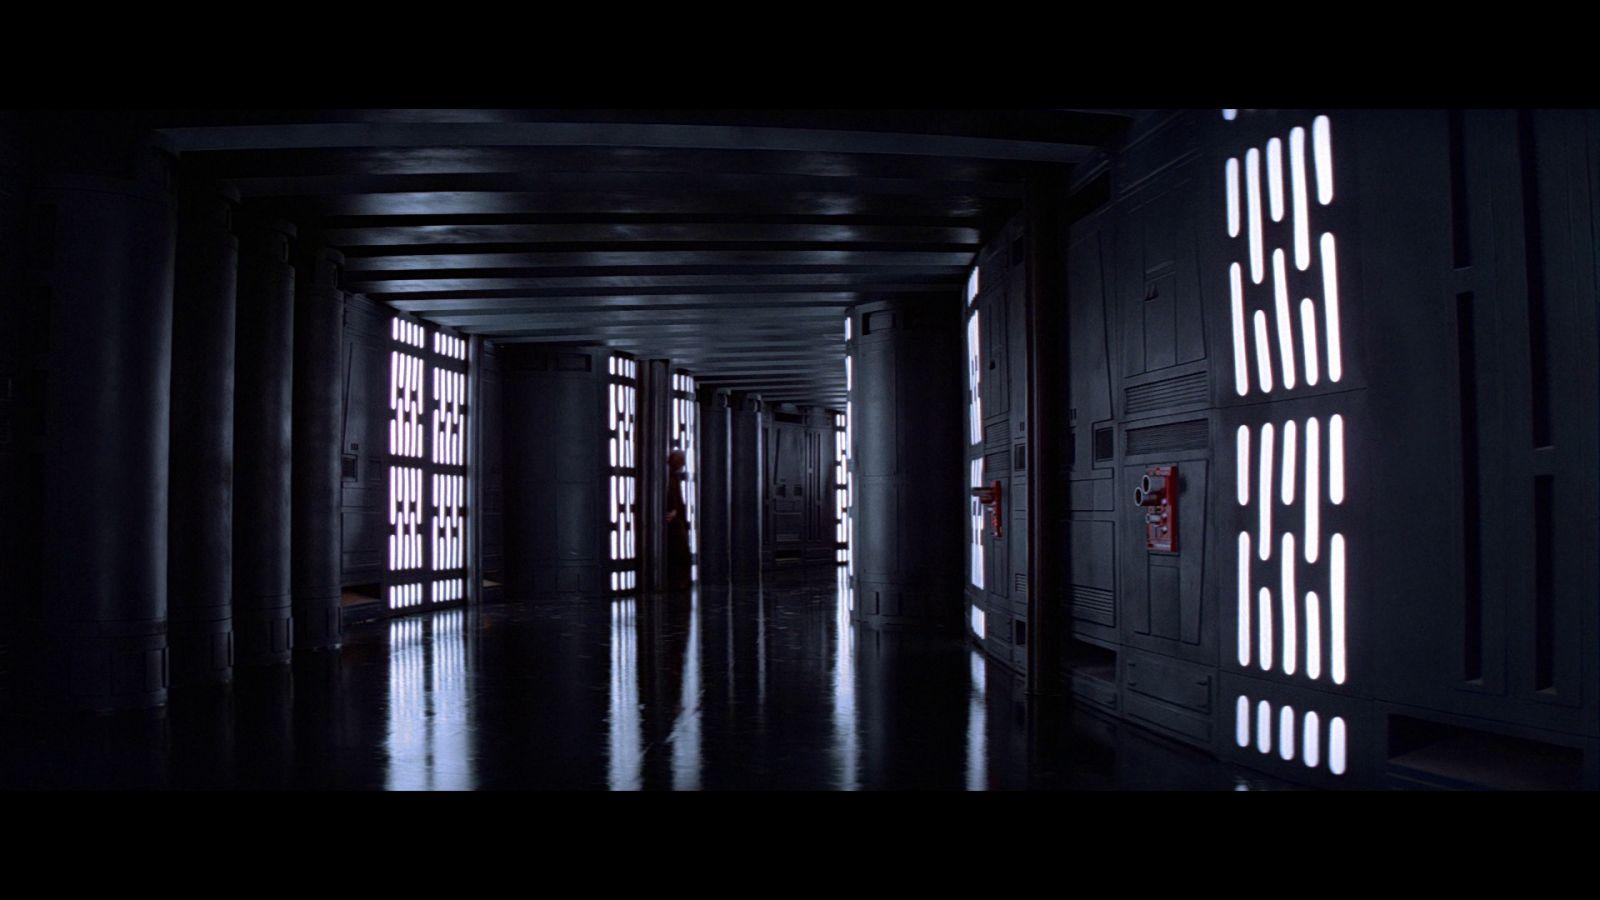 Star Wars A New Hope Bluray Capture 03-23.jpg